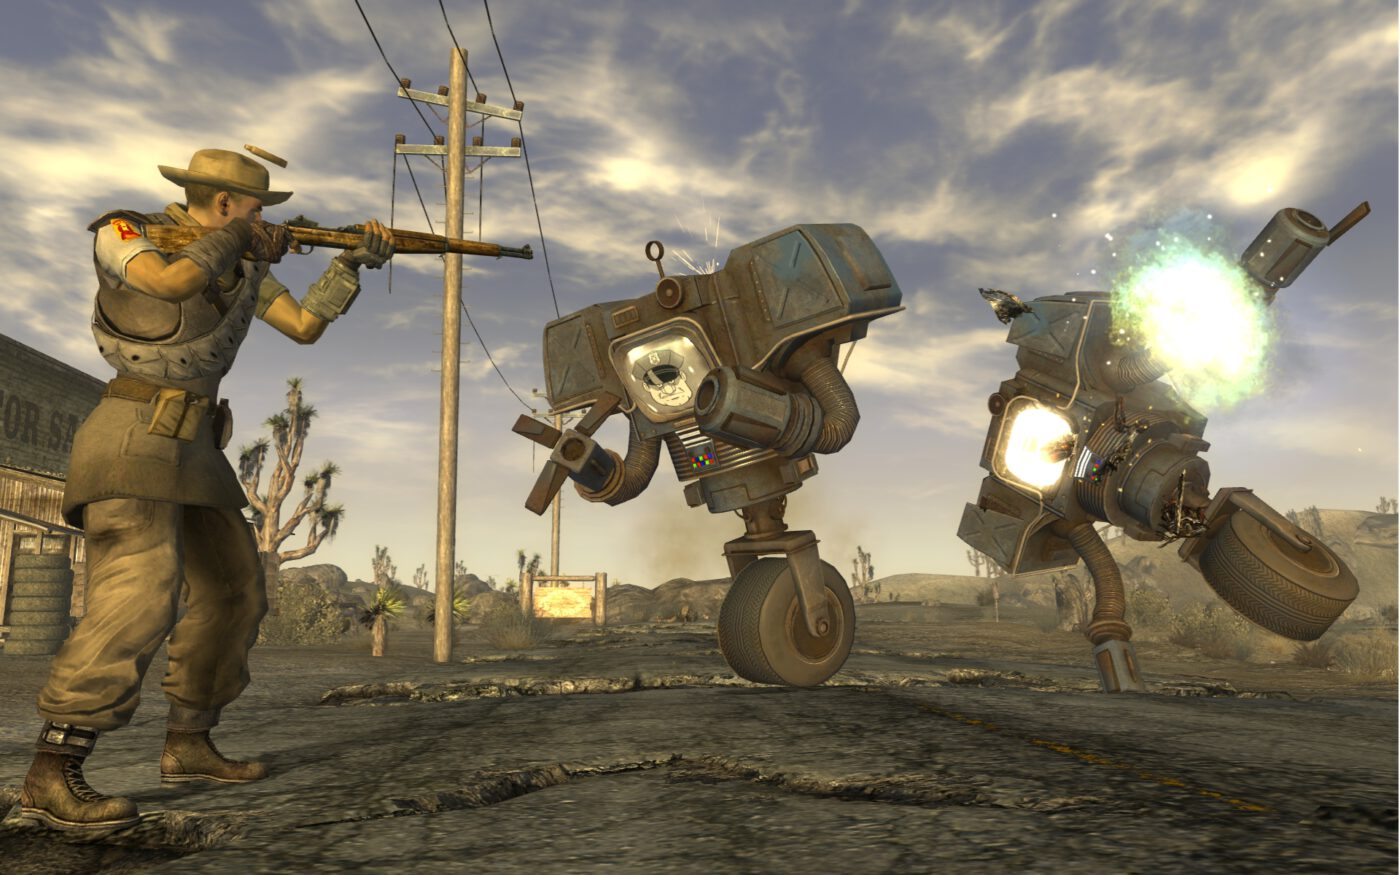 Favorite Video Game Dystopian Earths: Fallout New Vegas